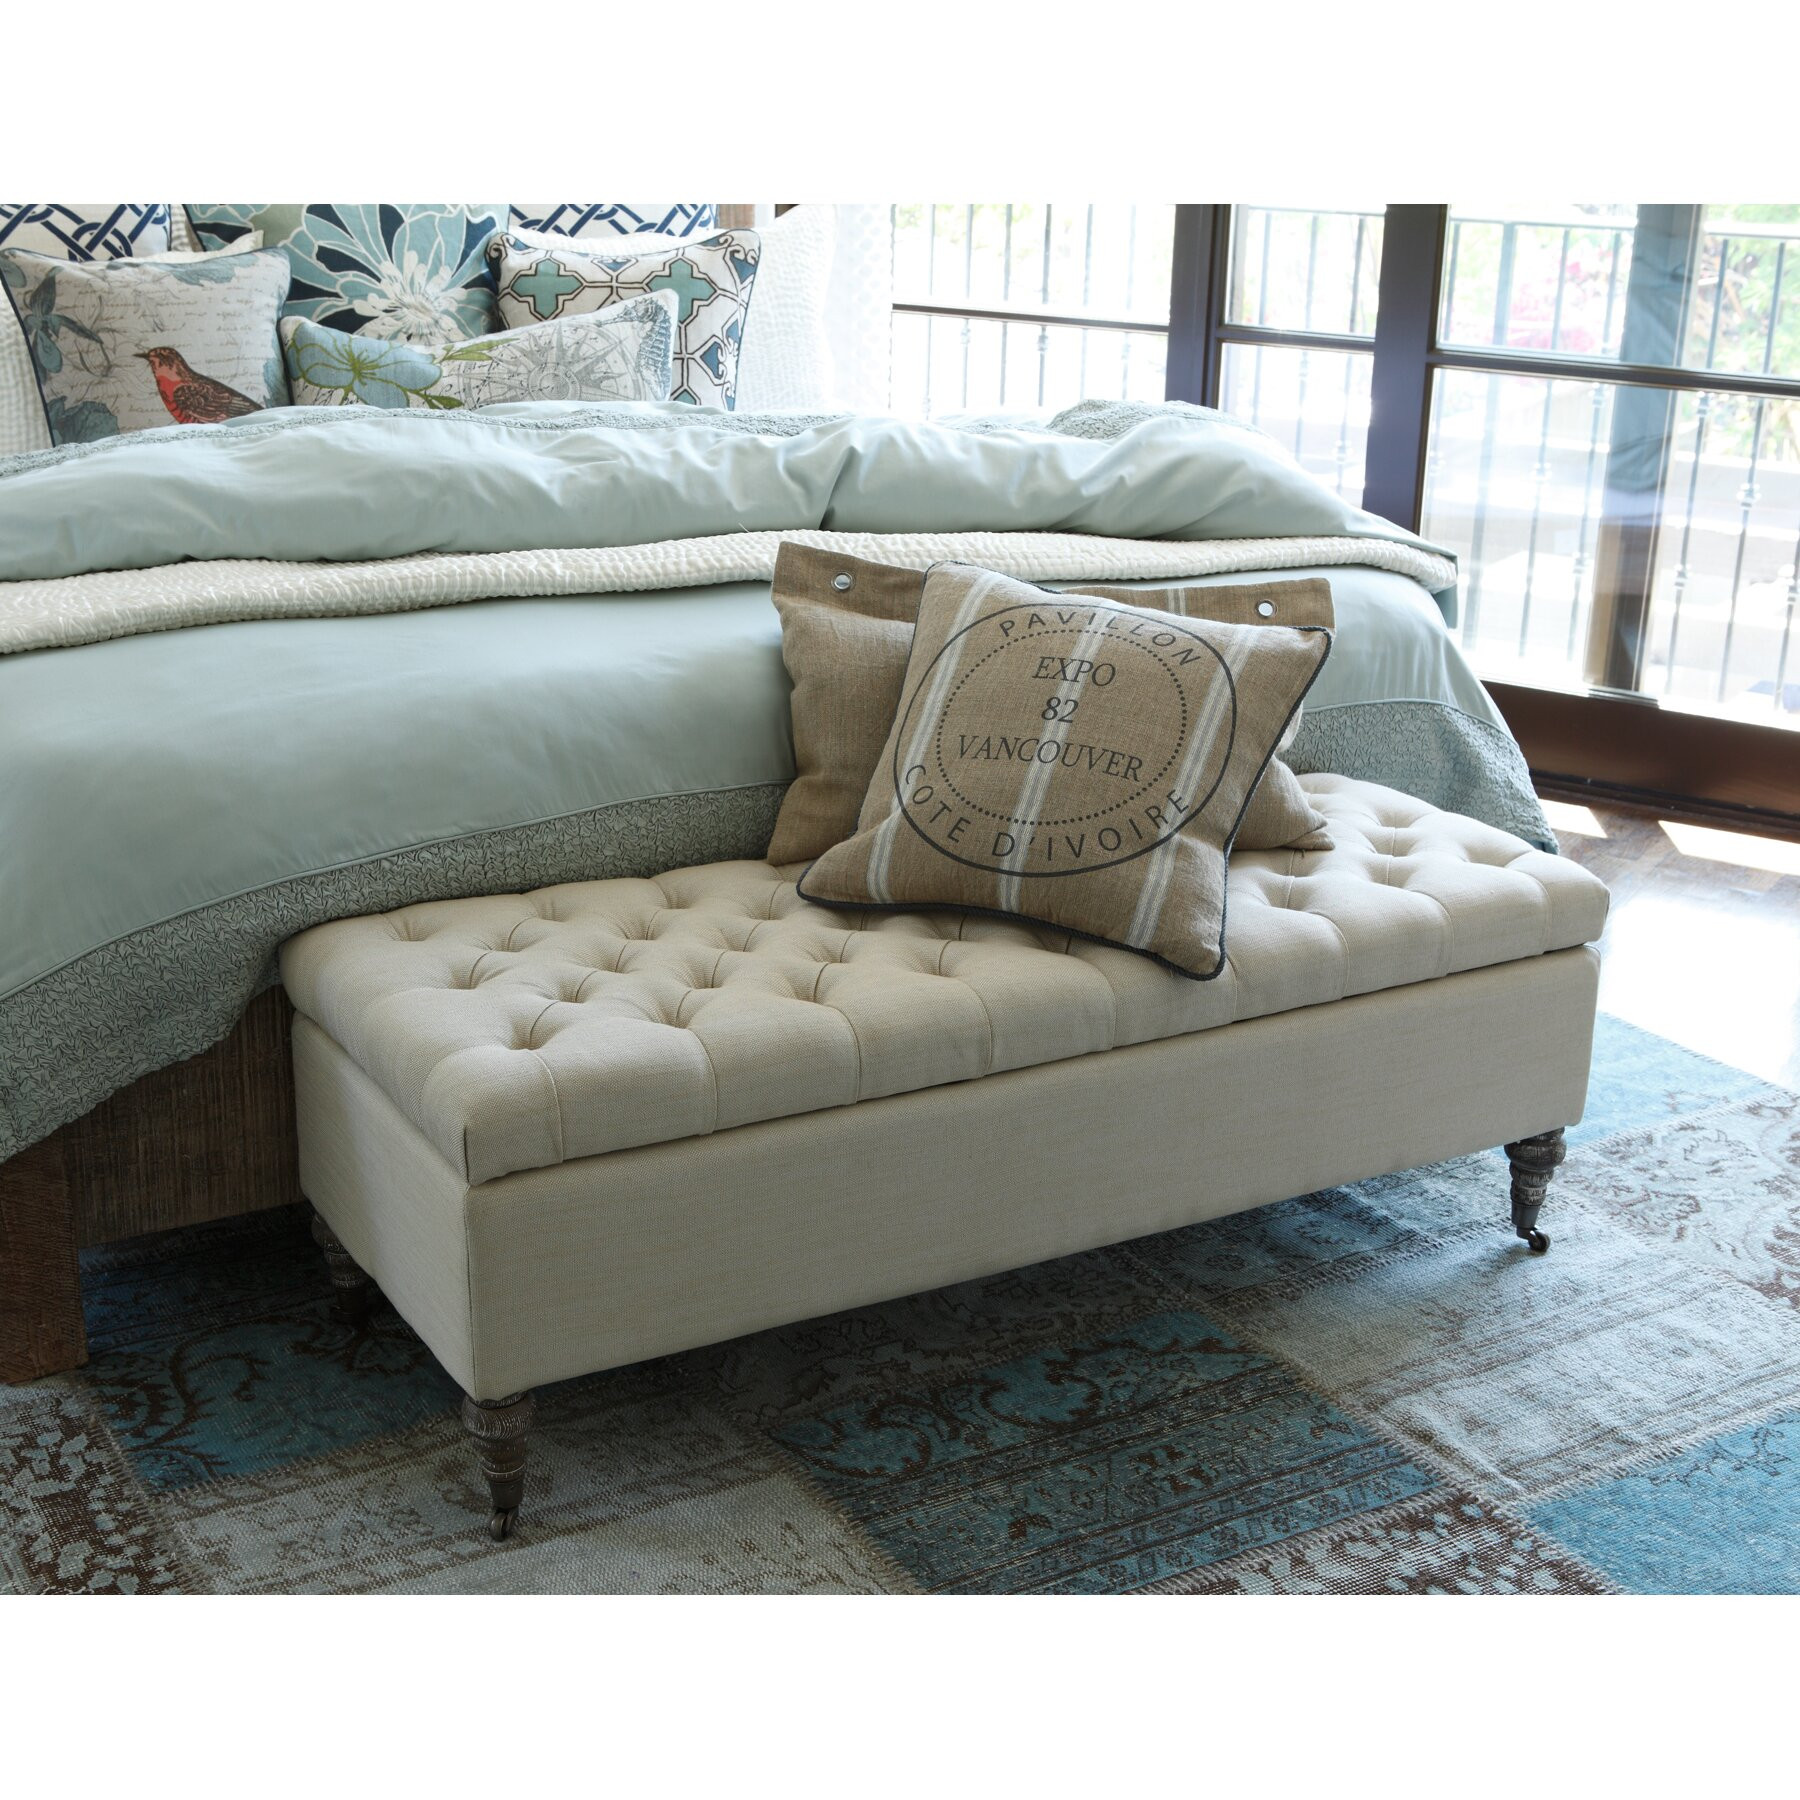 Storage Bench Bedroom  Kosas Home Fabric Storage Bedroom Bench & Reviews